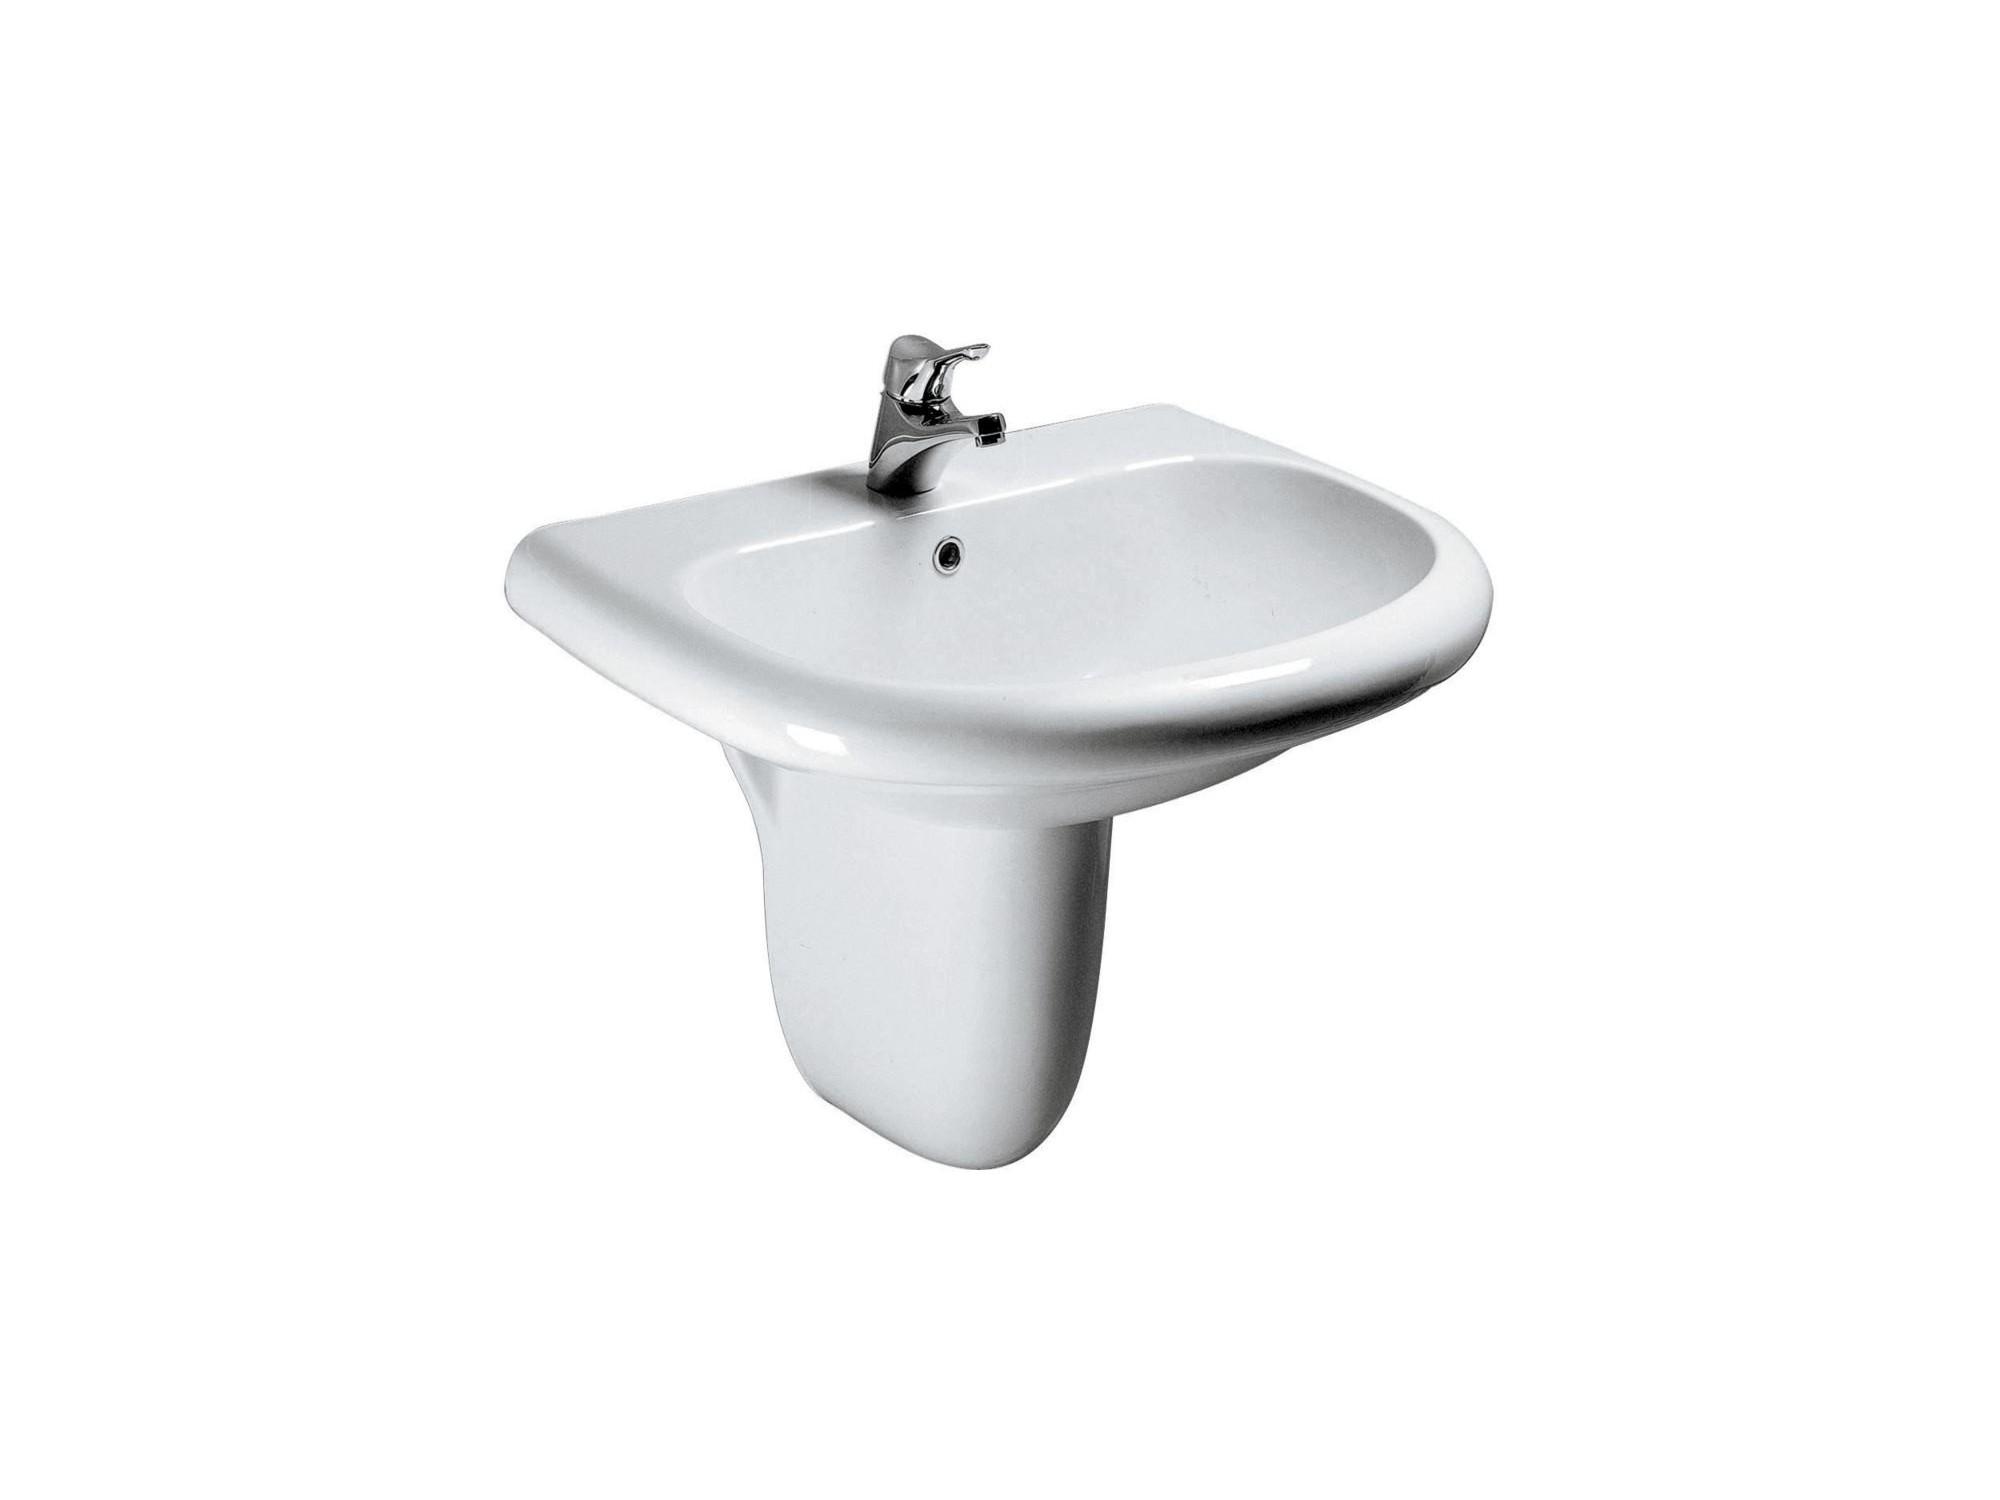 Ideal Standard Lavabo Tesi.Ideal Standard Tesi Classic Lavabo Bacino Ampio